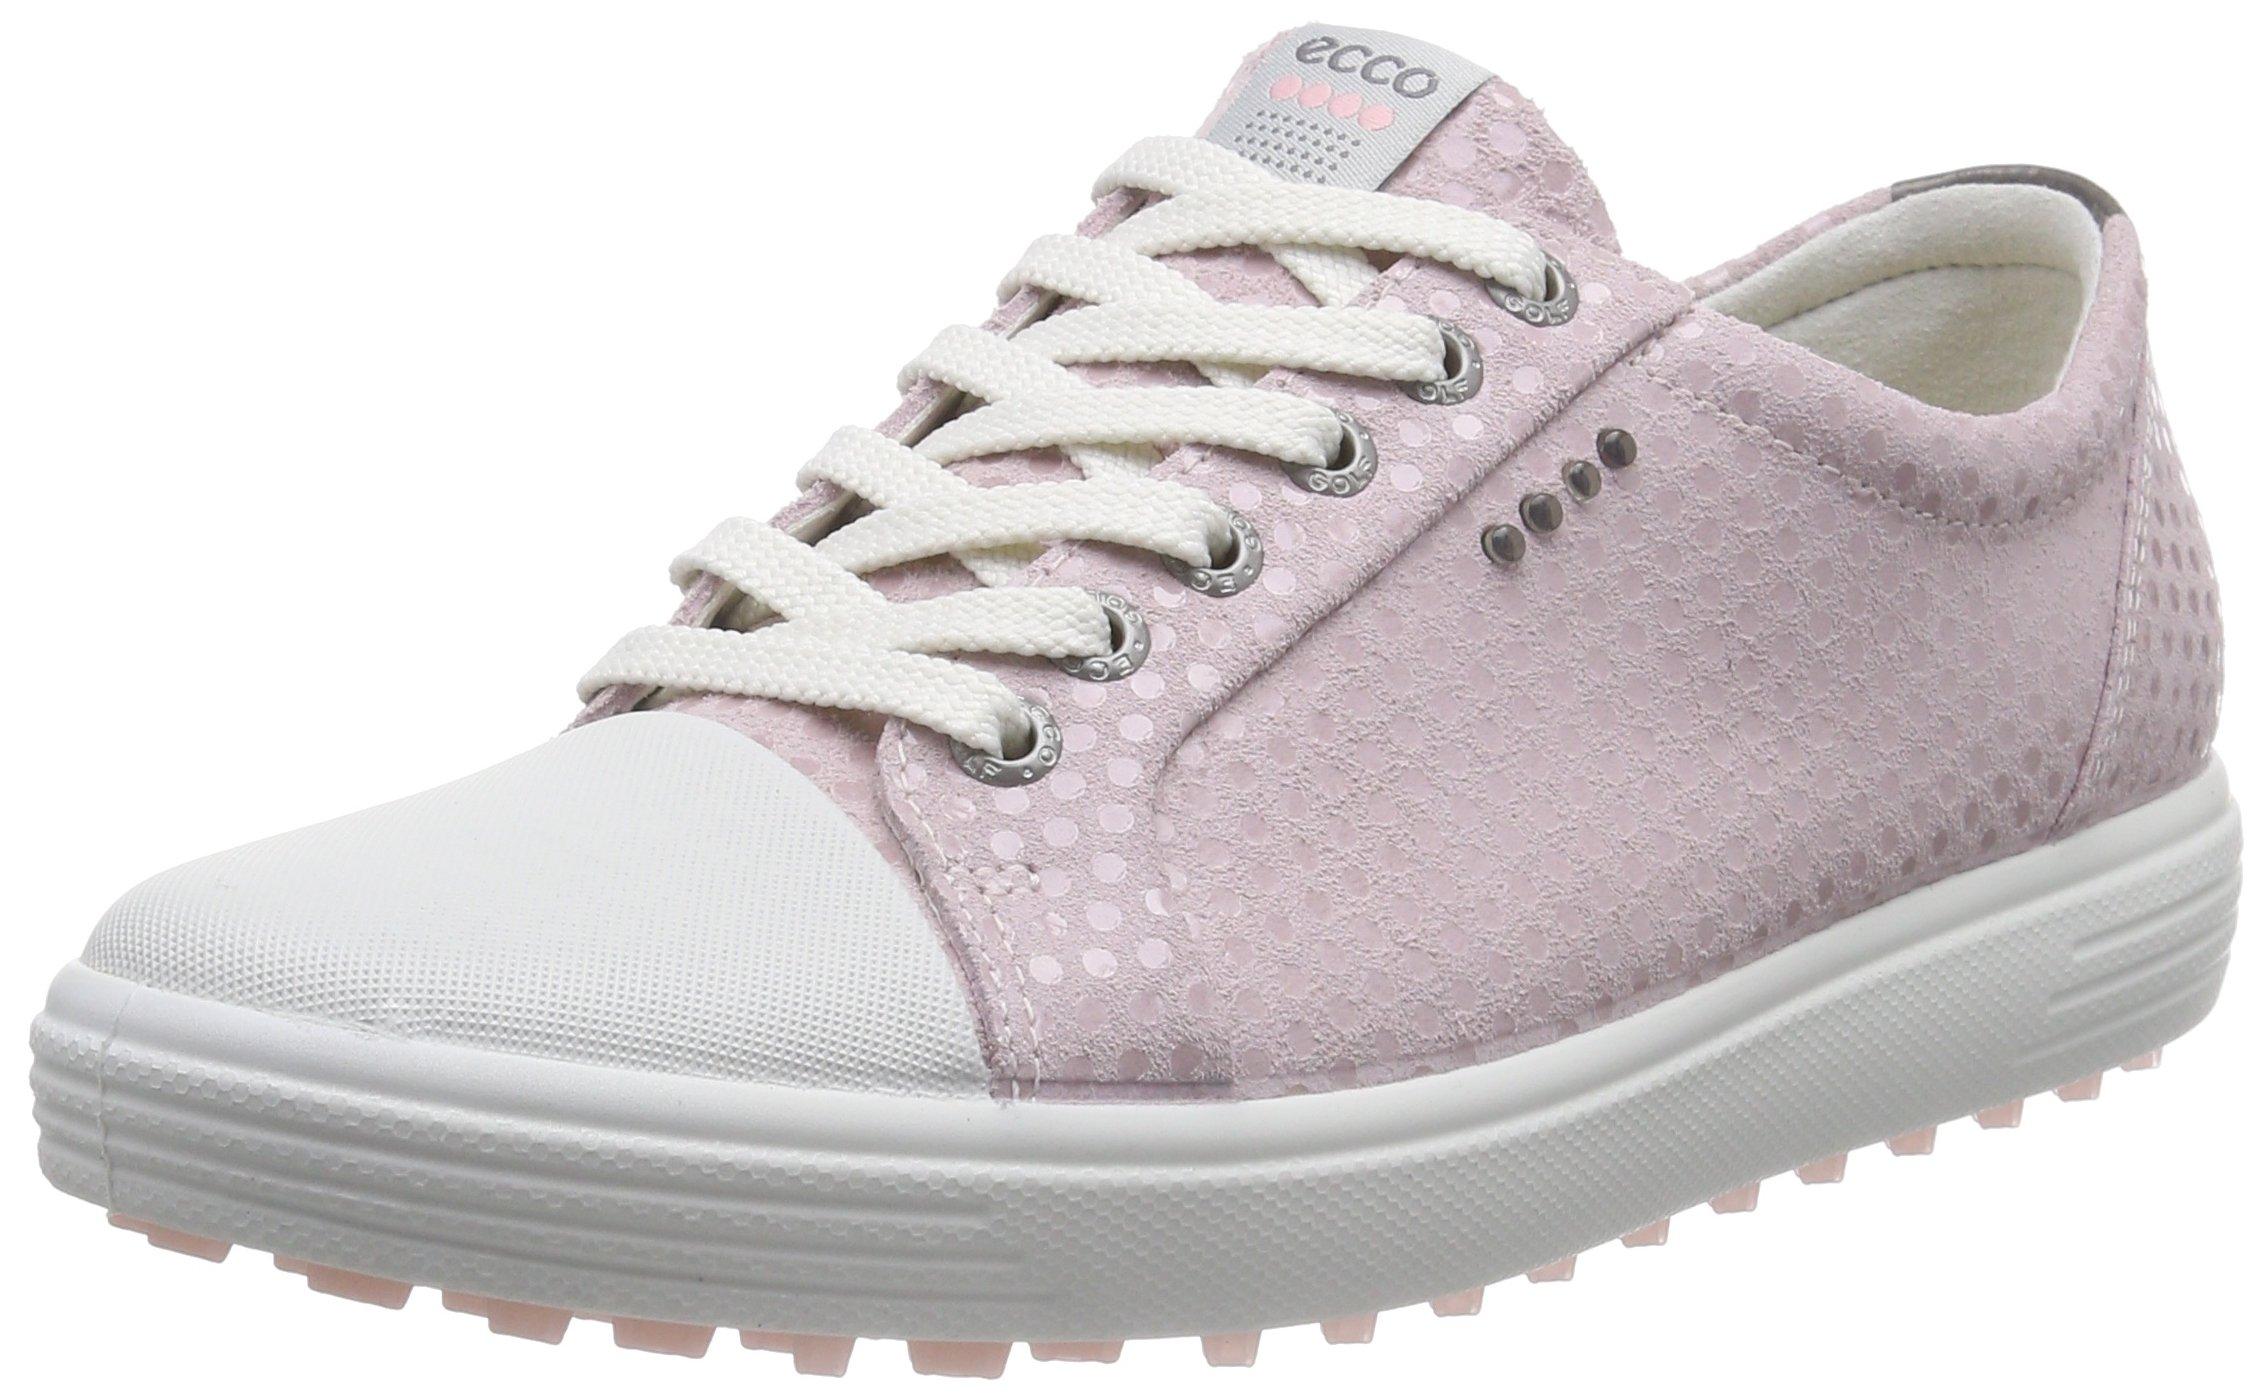 ECCO Women's Casual Hybrid Golf Shoe, Violet Ice, 40 EU/9-9.5 M US